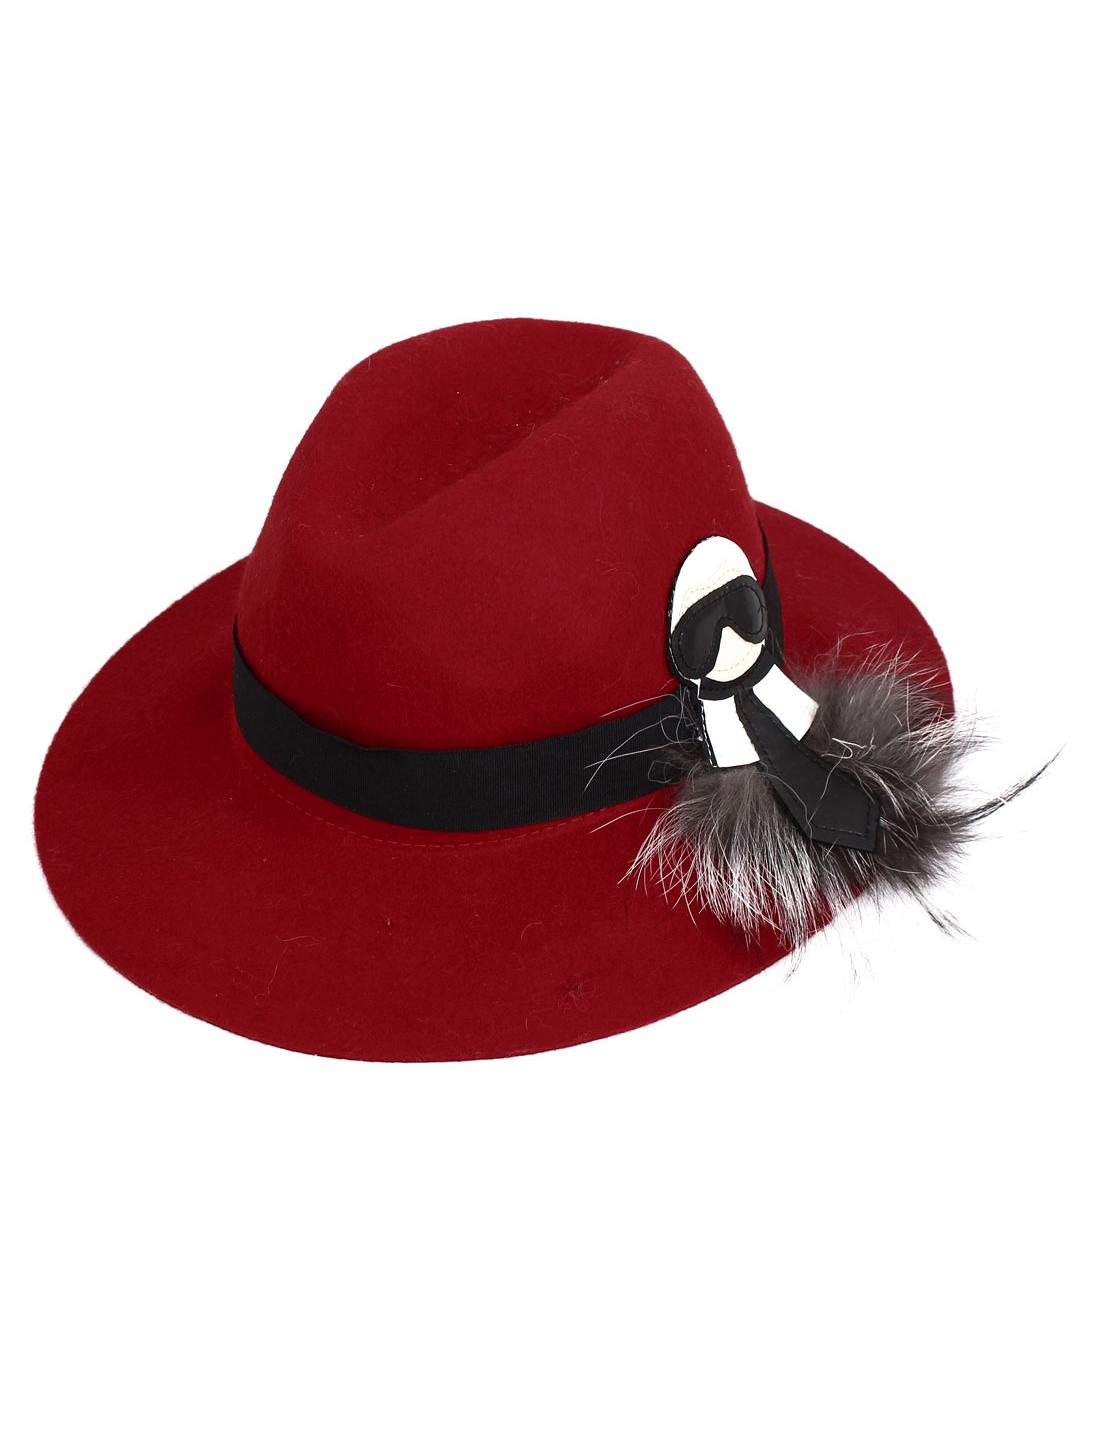 Lady Women Felt Wide Brim Wedding Party Winter Bowler Cloche Hat Cap Red